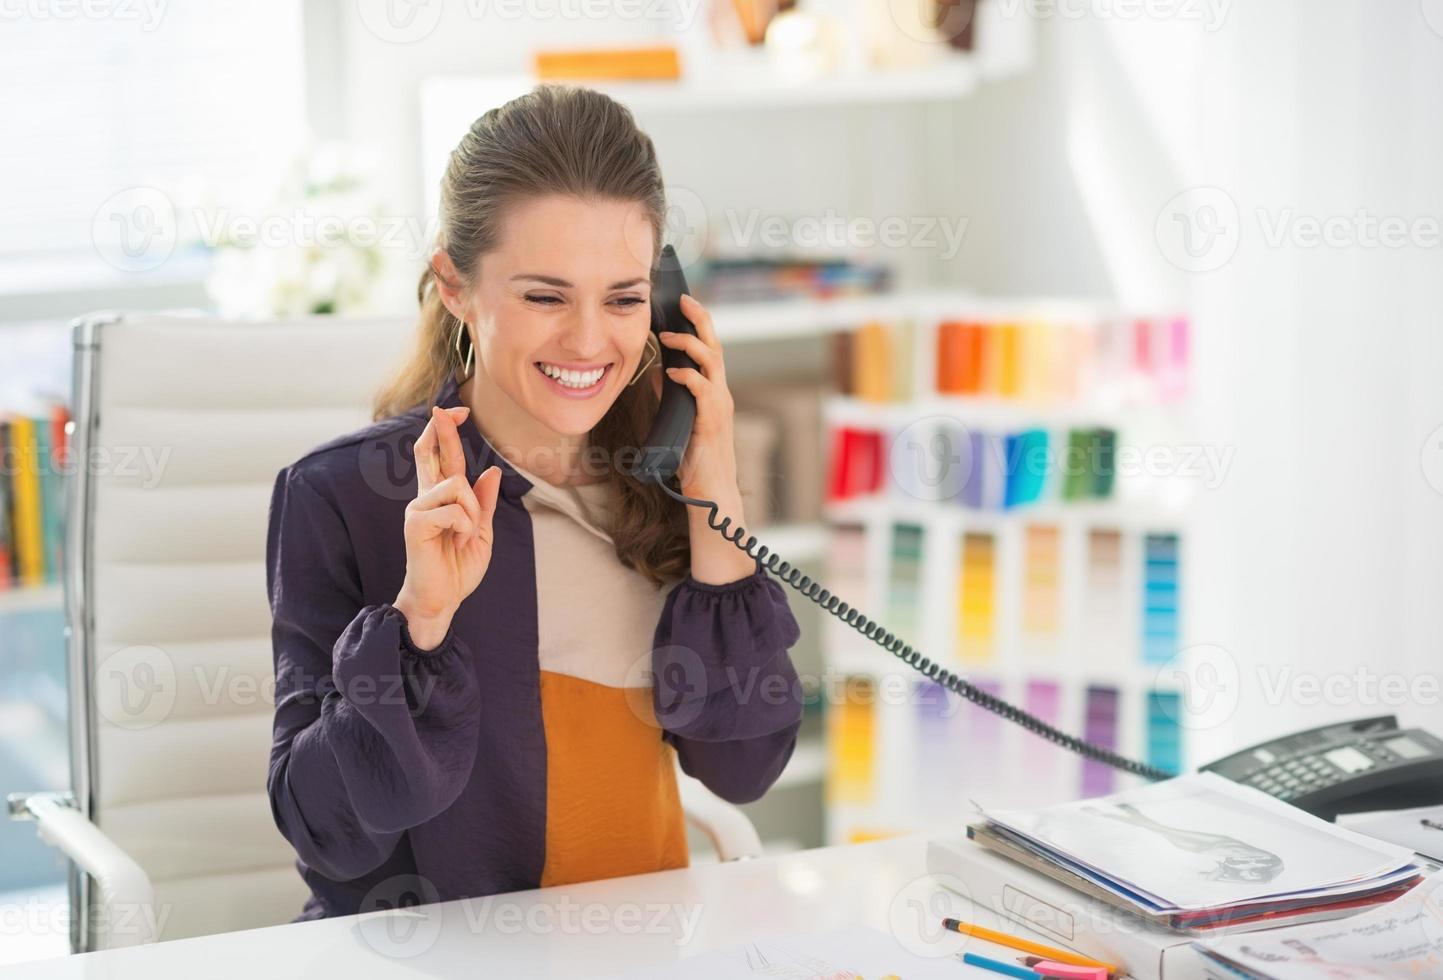 gelukkig modeontwerper praten telefoon met gekruiste vingers foto